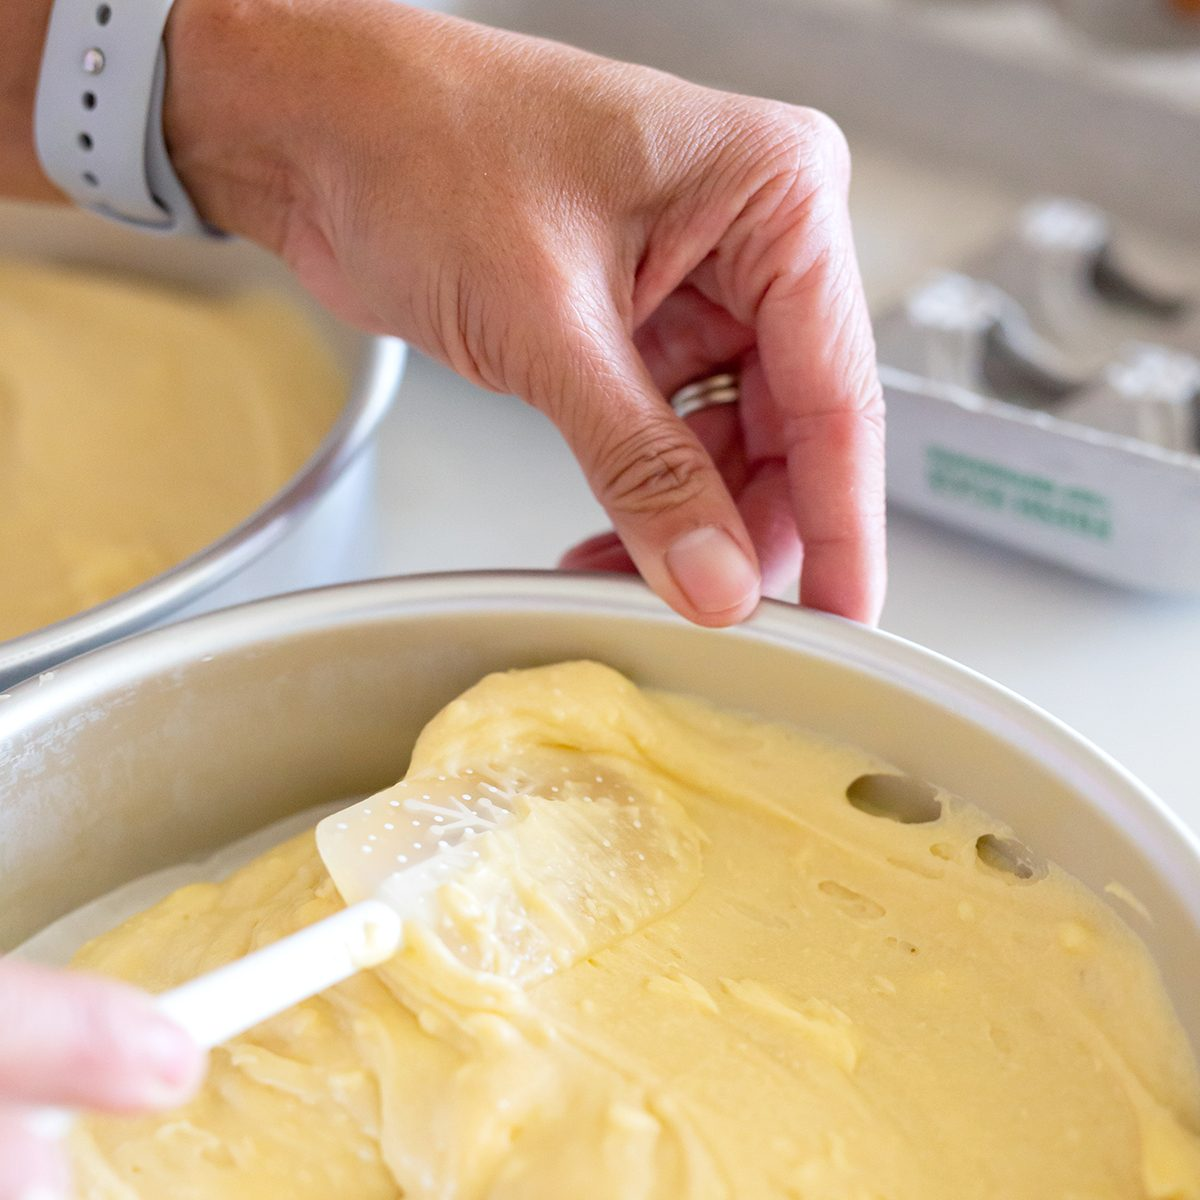 Yellow Cake Mix Spread in Pan; Shutterstock ID 1485217412; Job (TFH, TOH, RD, BNB, CWM, CM): TOH